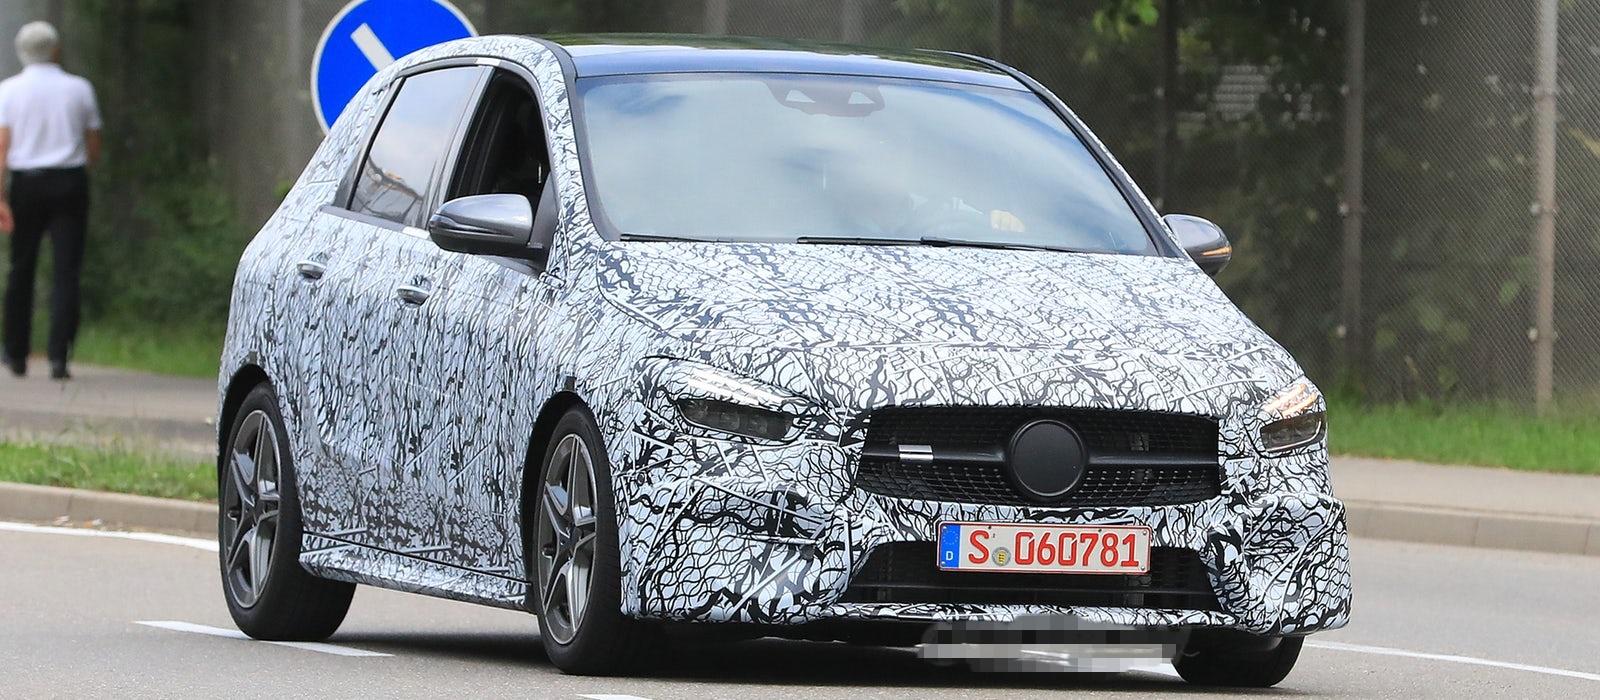 Špijuniran prototip Mercedes-Benza B klase